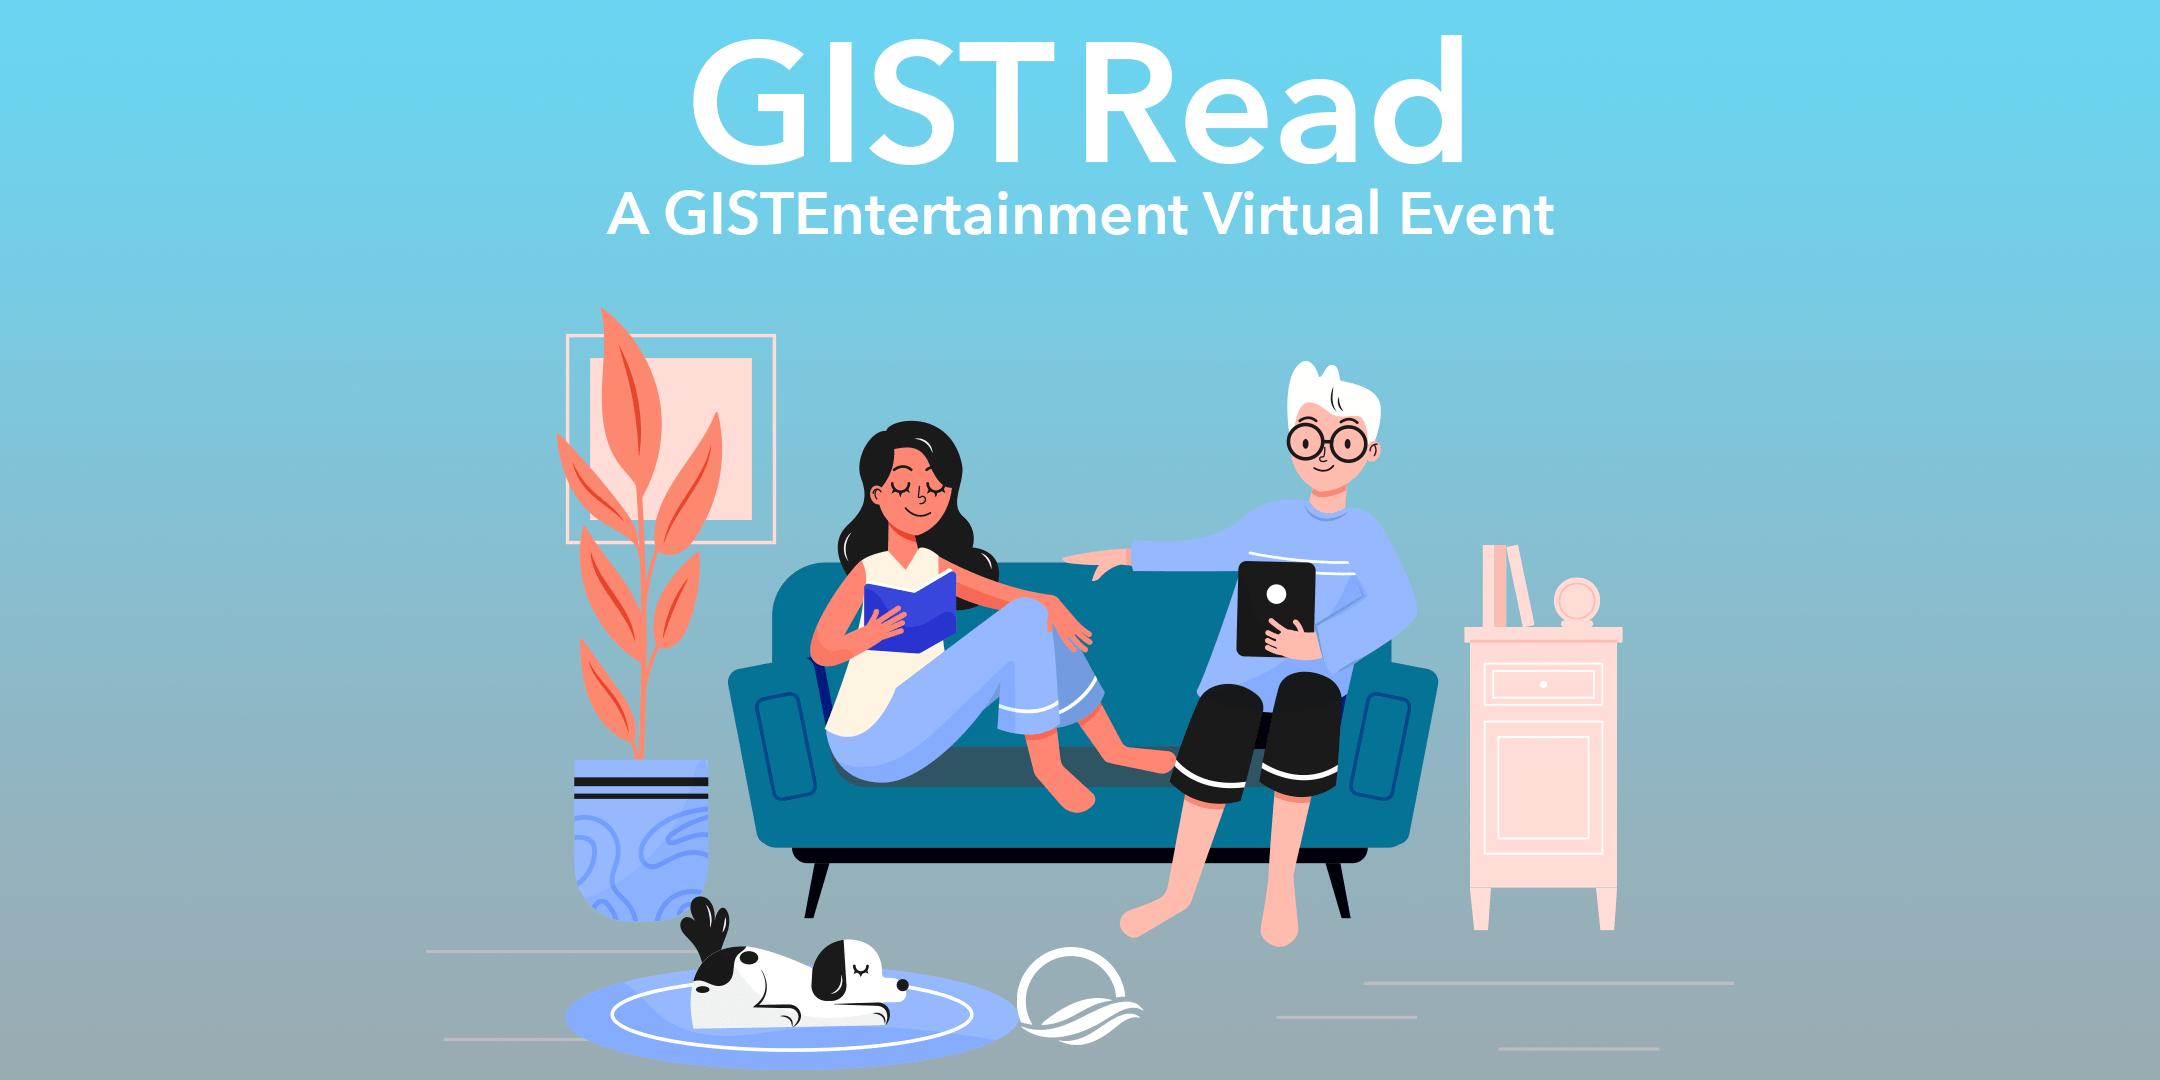 GIST Read